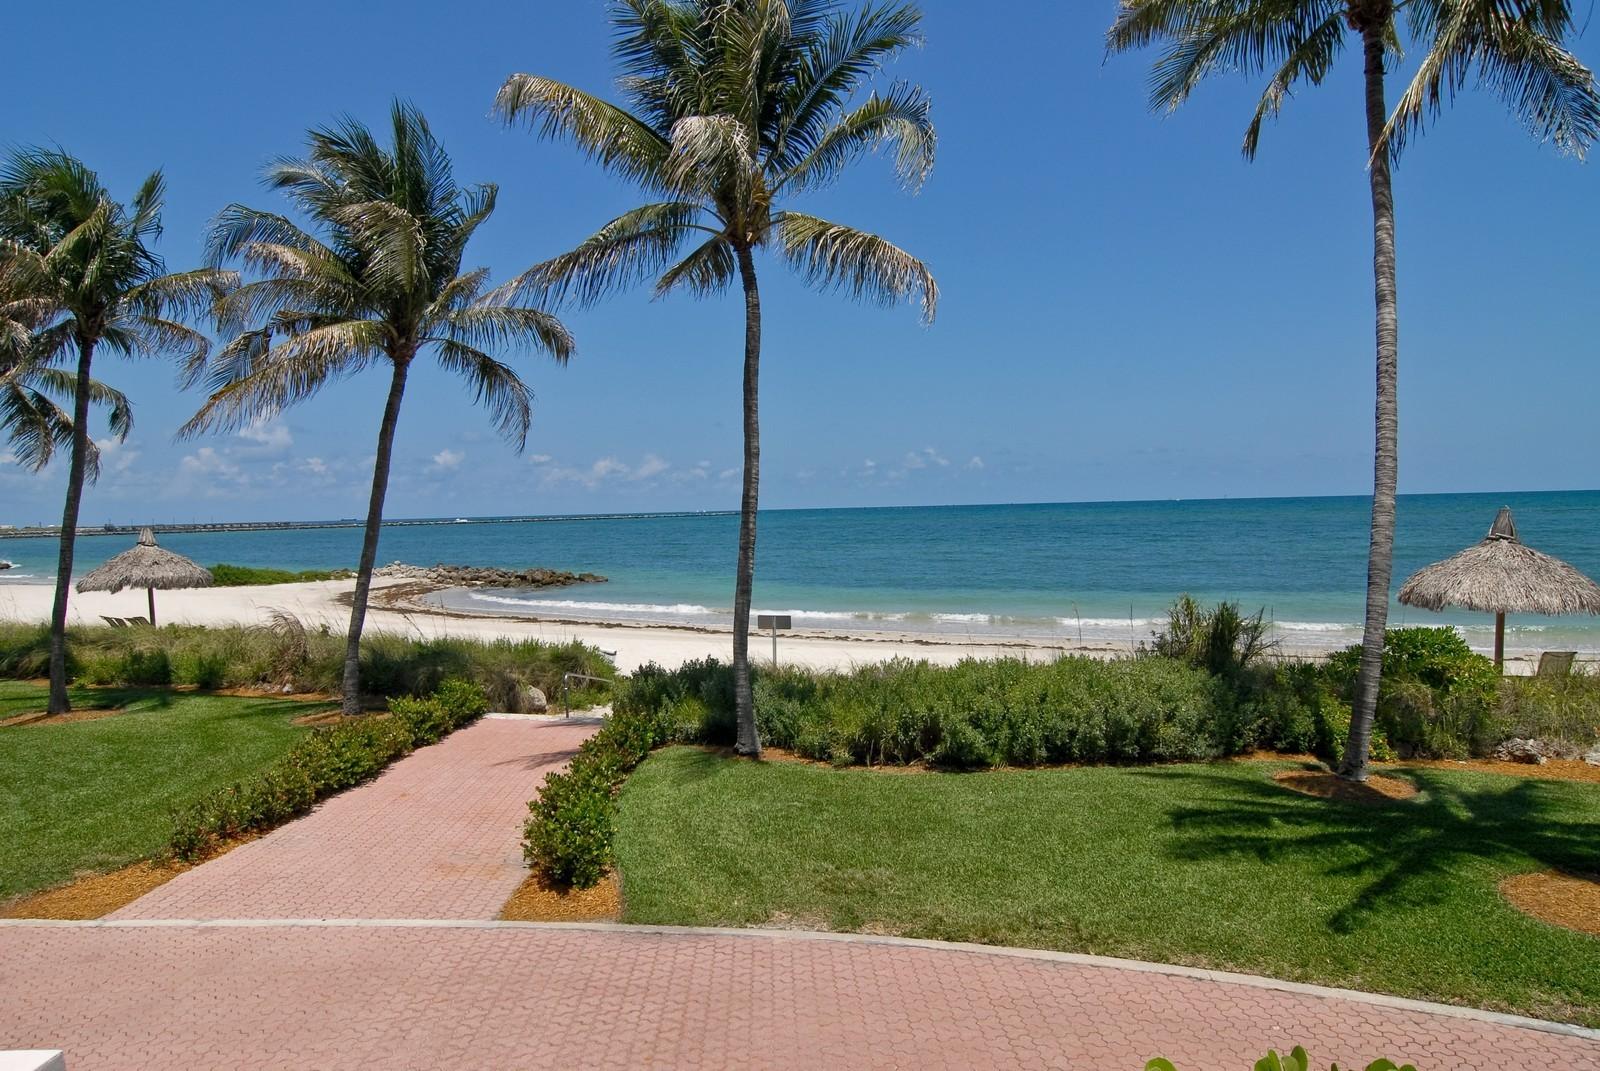 Real Estate Photography - 7161 Fisher Island Drive, Miami Beach, FL, 33109 - Beach